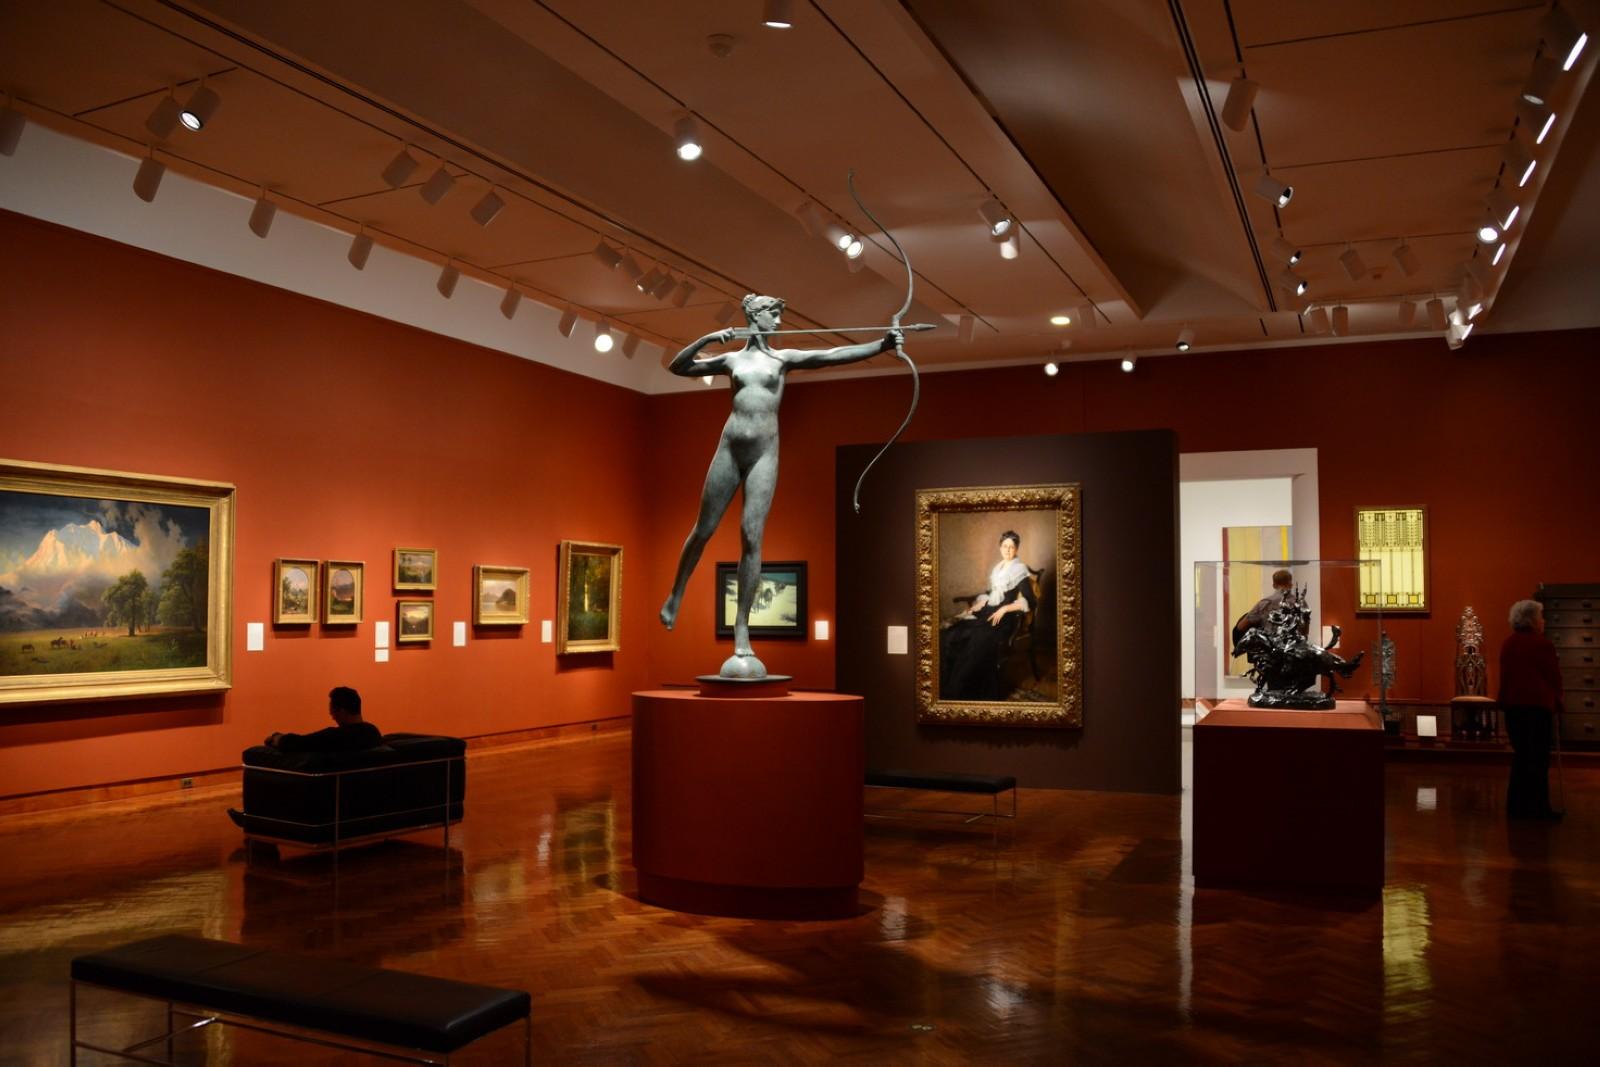 - Princeton University Art Museum Storewww.artmuseum.princeton.eduPrinceton, NJ